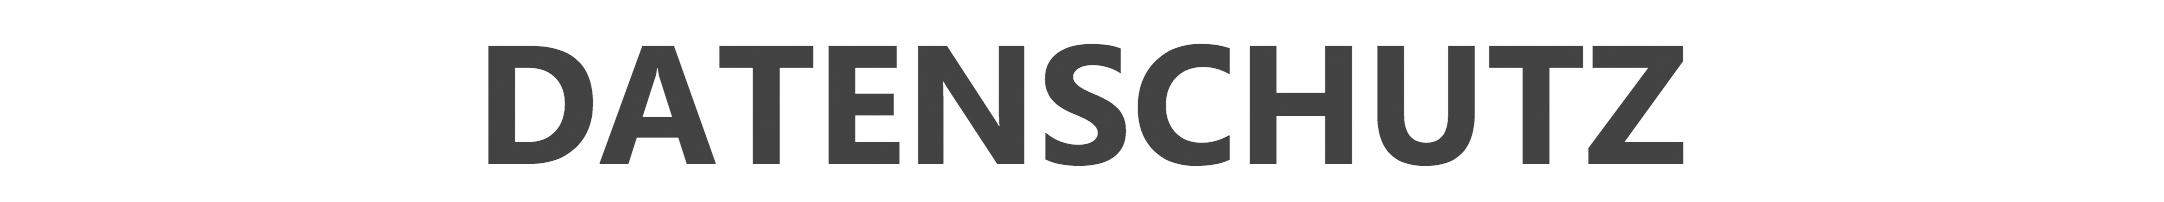 Branding Division - Datenschutz